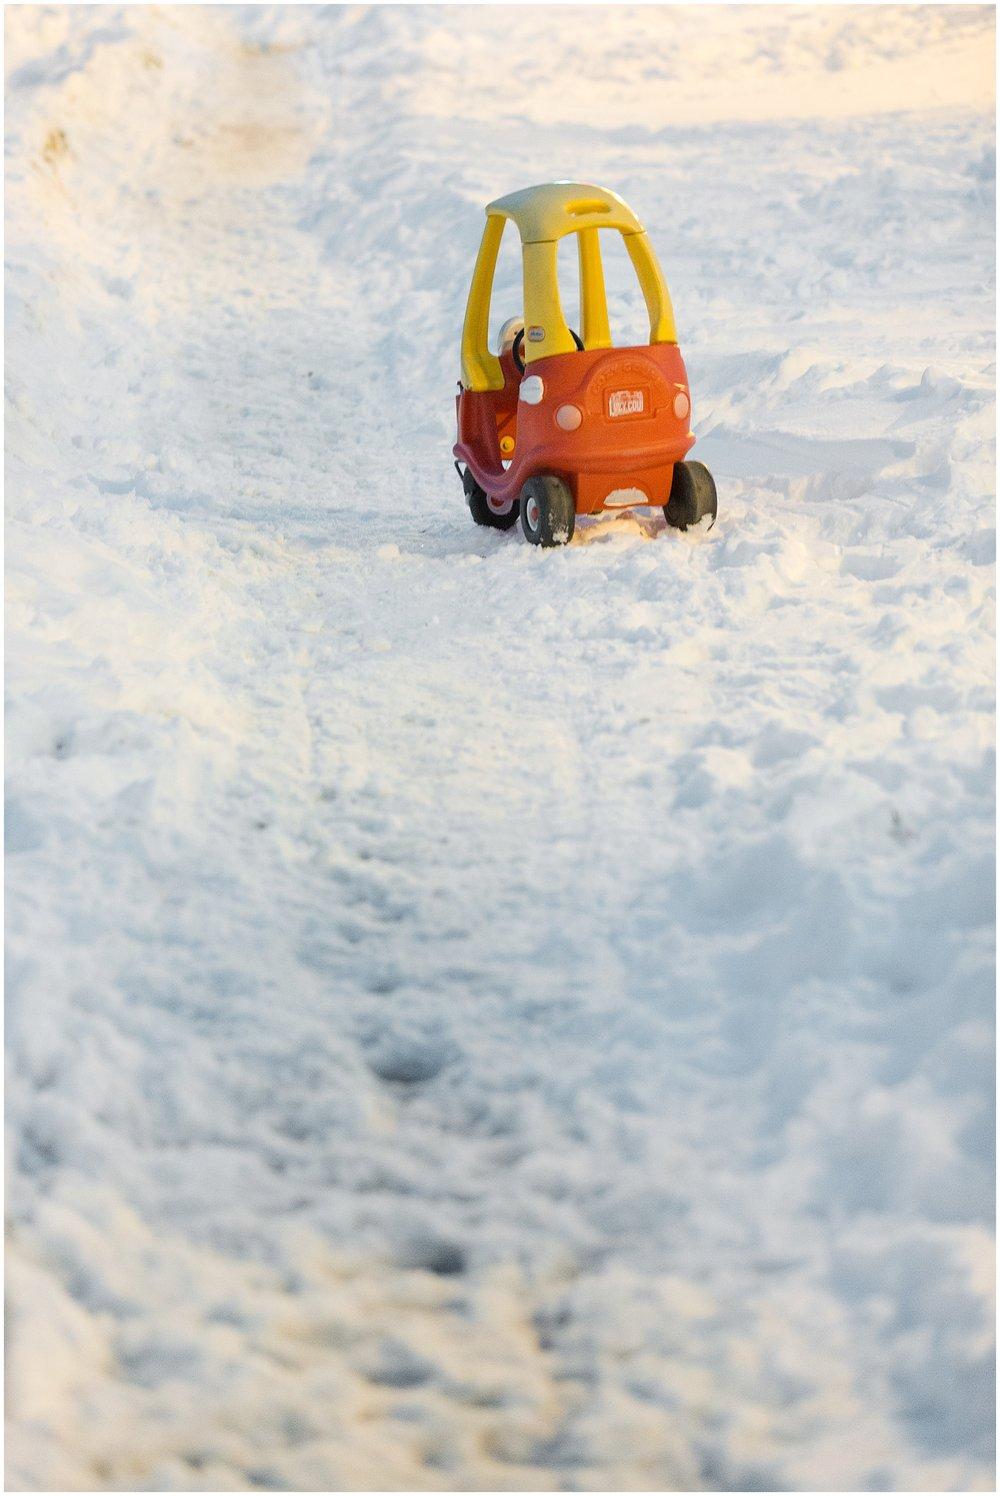 snow__VGF_3052_0052.jpg